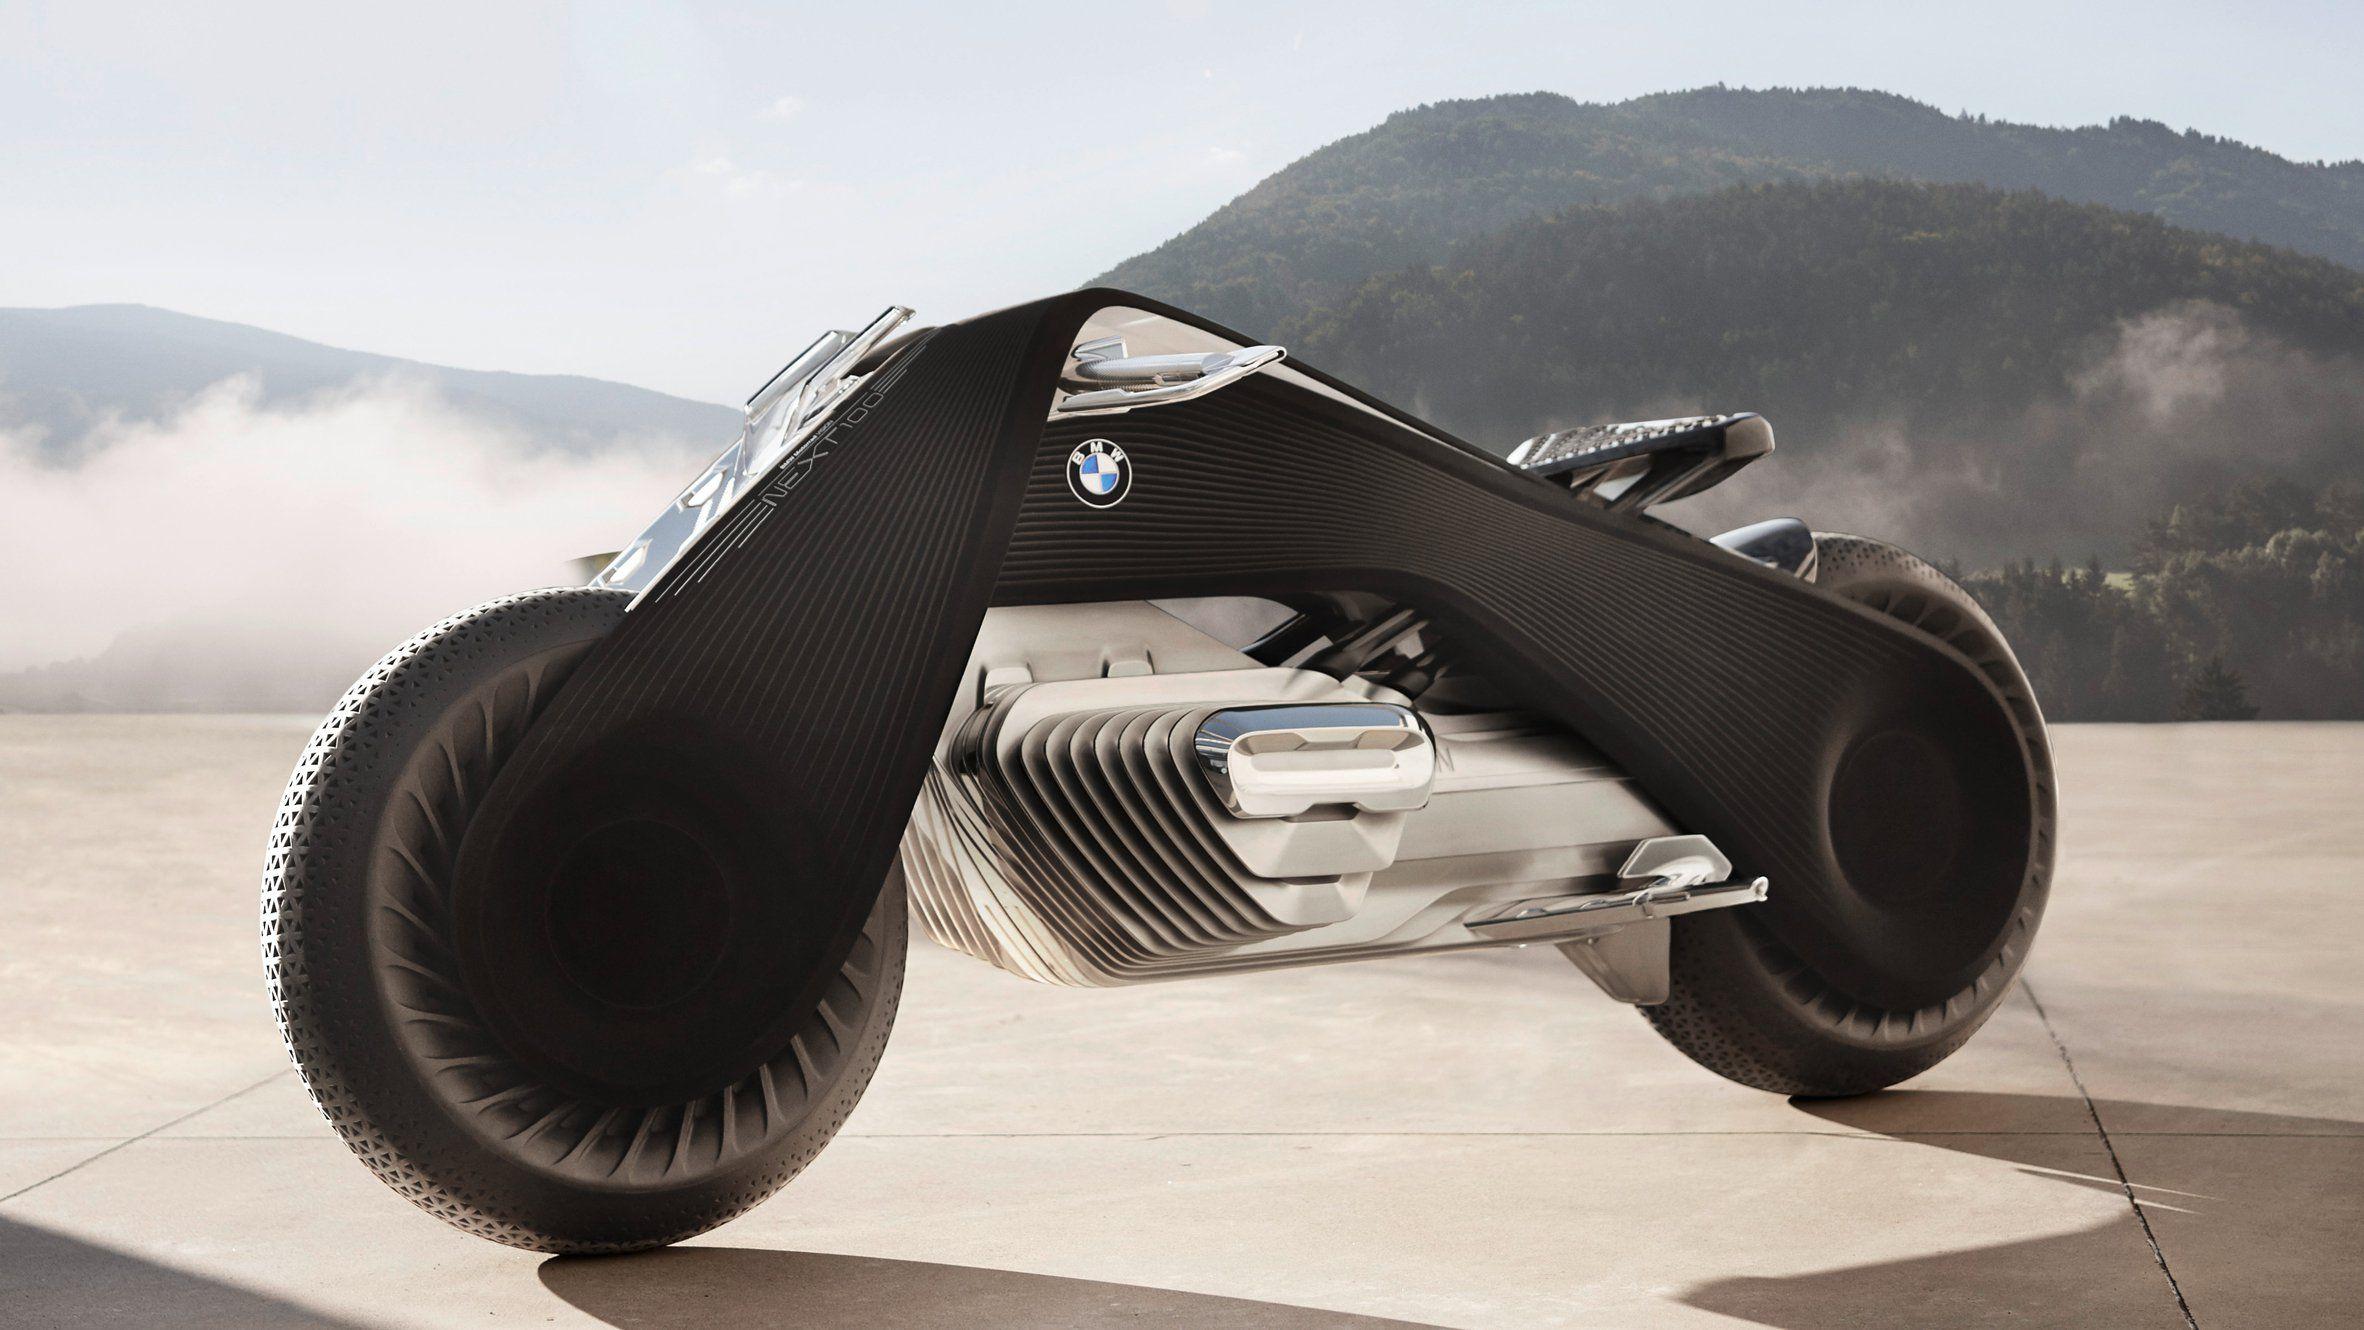 bmw's latest concept vehicle, the zero-emissions bmw motorrad